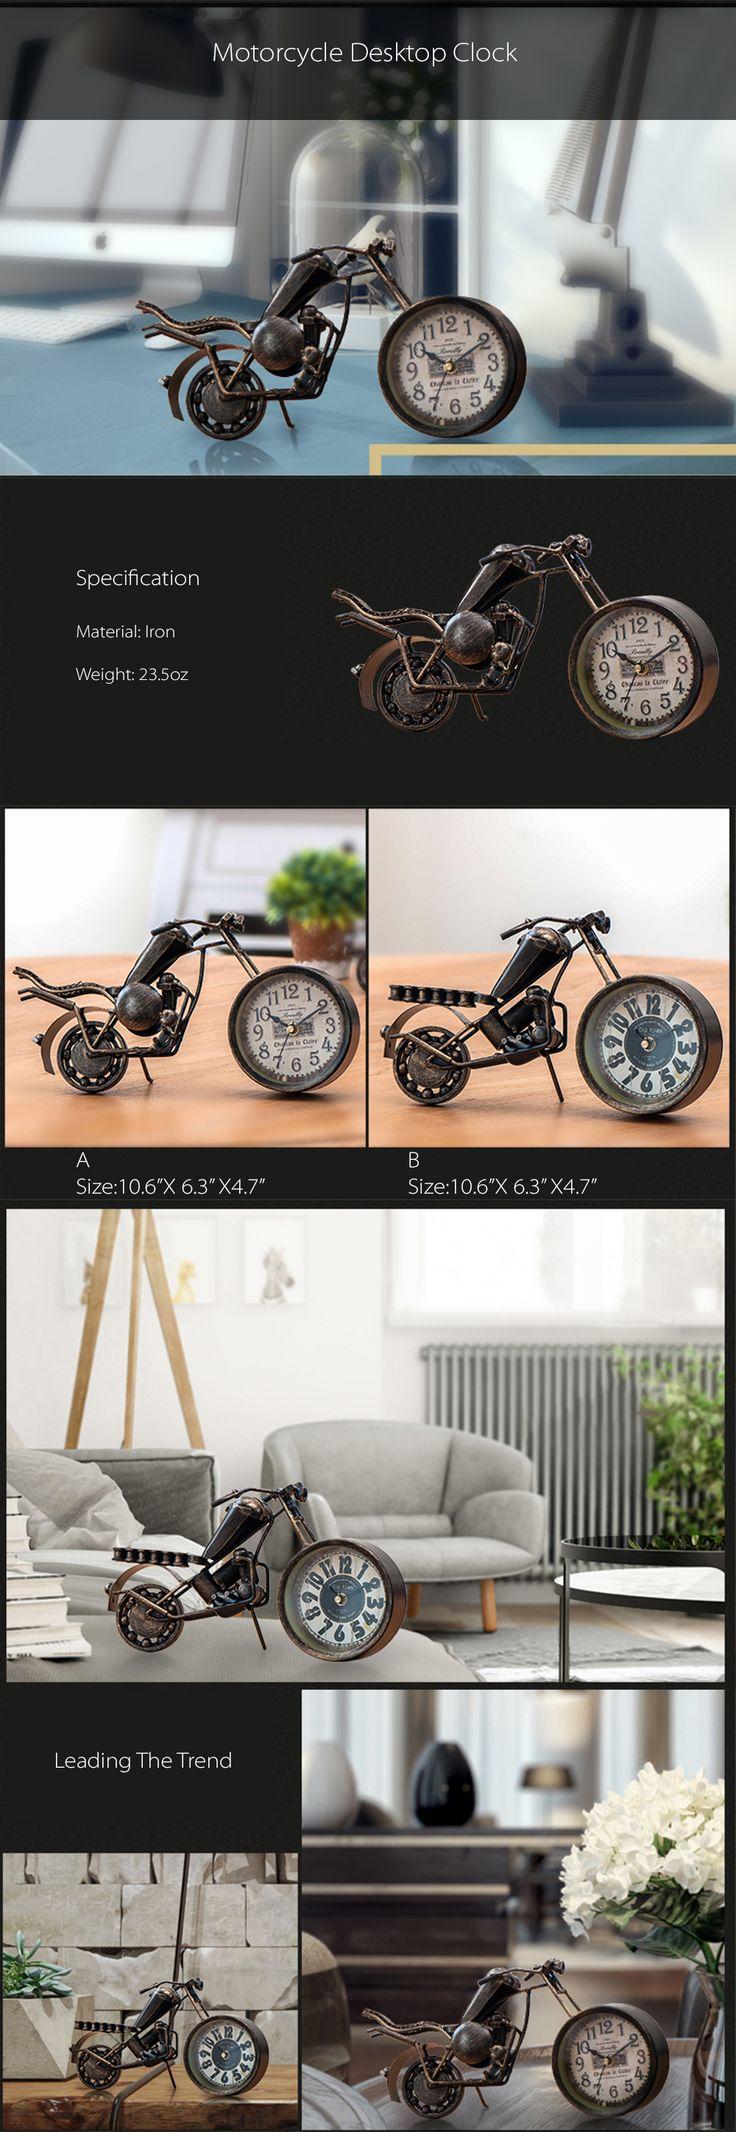 Motorcycle Desktop Clock Great Gift For Motor Lovers